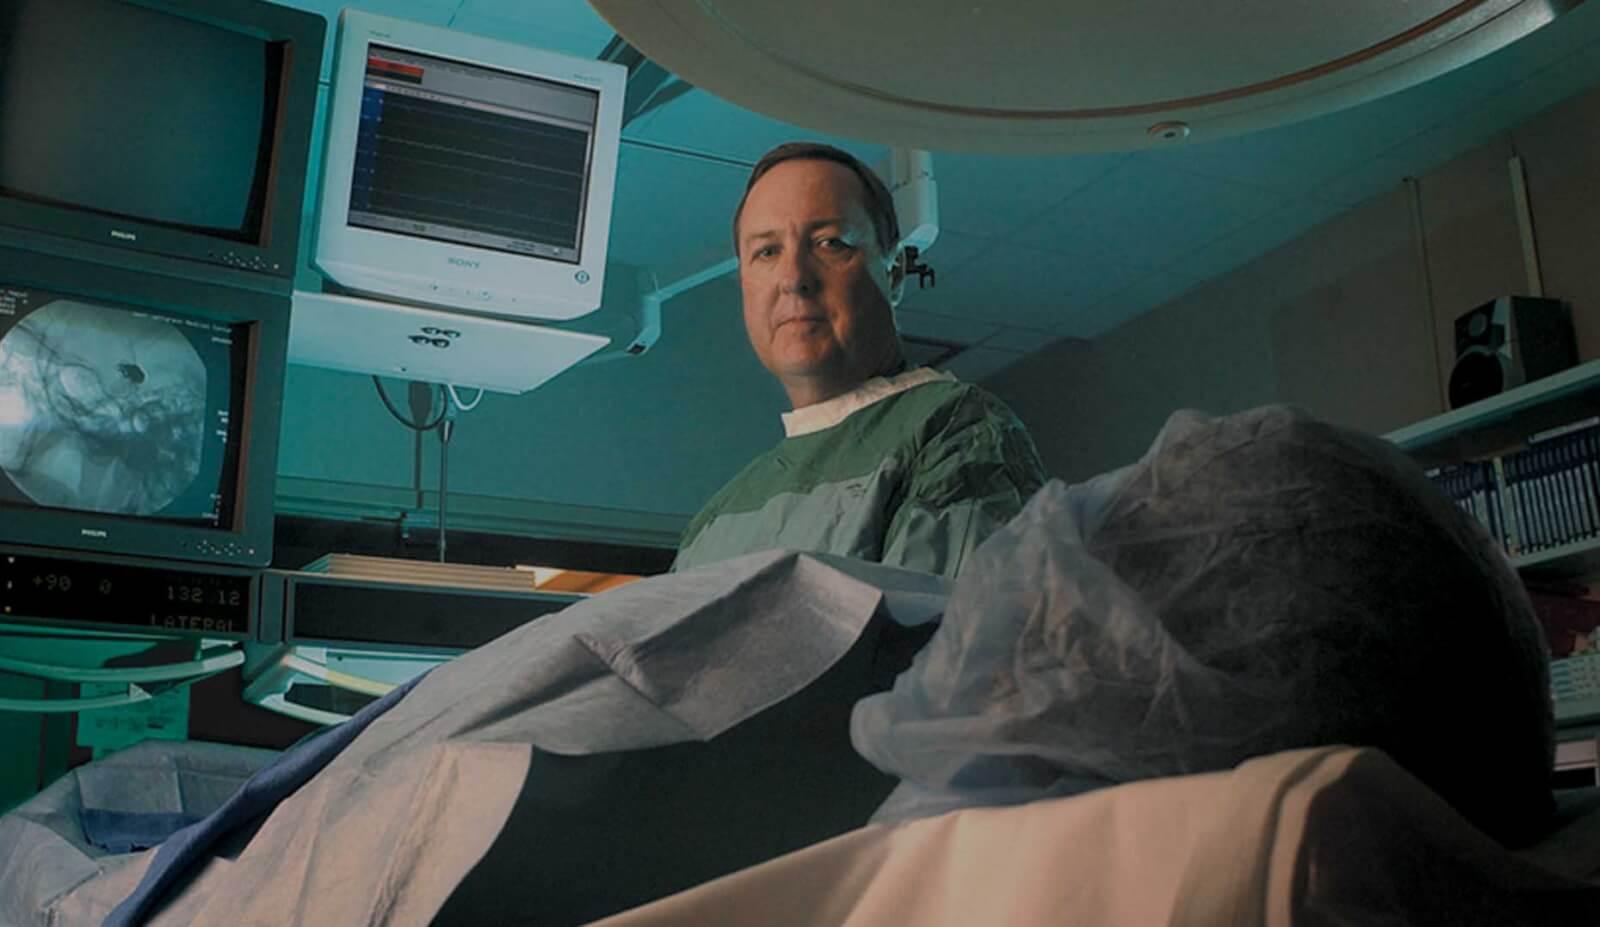 Culicchia Neurological Clinic New Orleans Robert Dawson MD